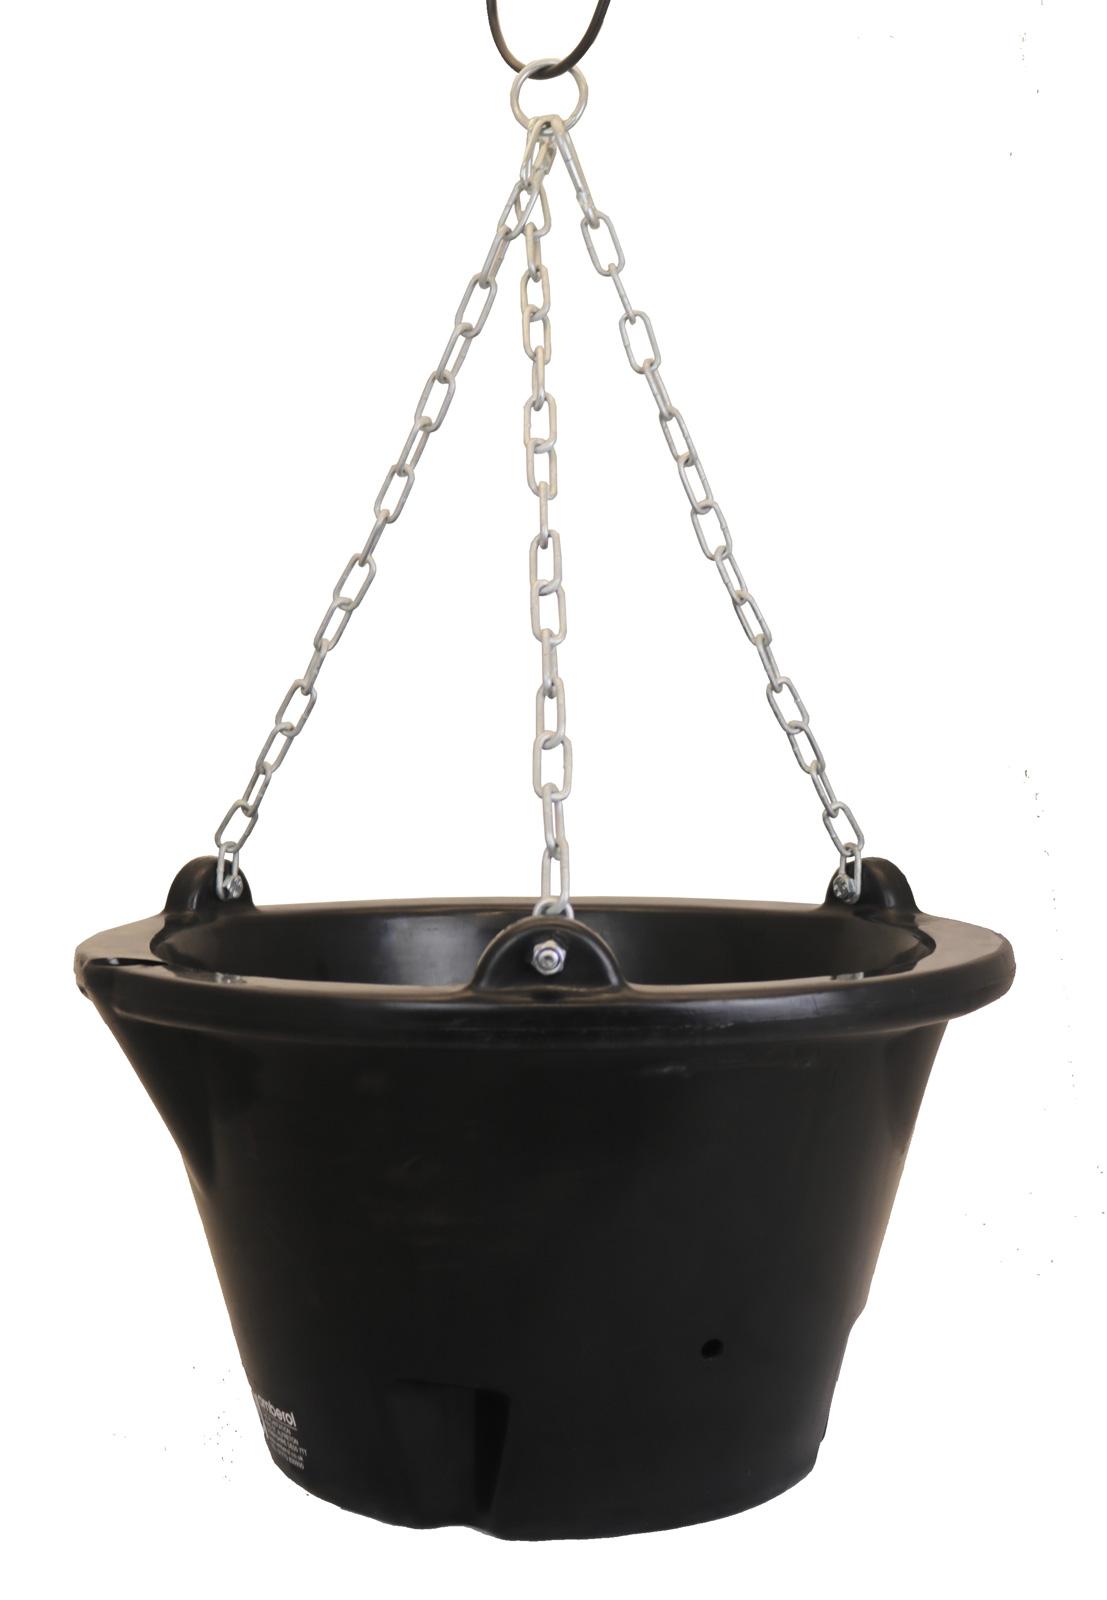 18 5 Quot Self Watering Commercial Grade Hanging Basket